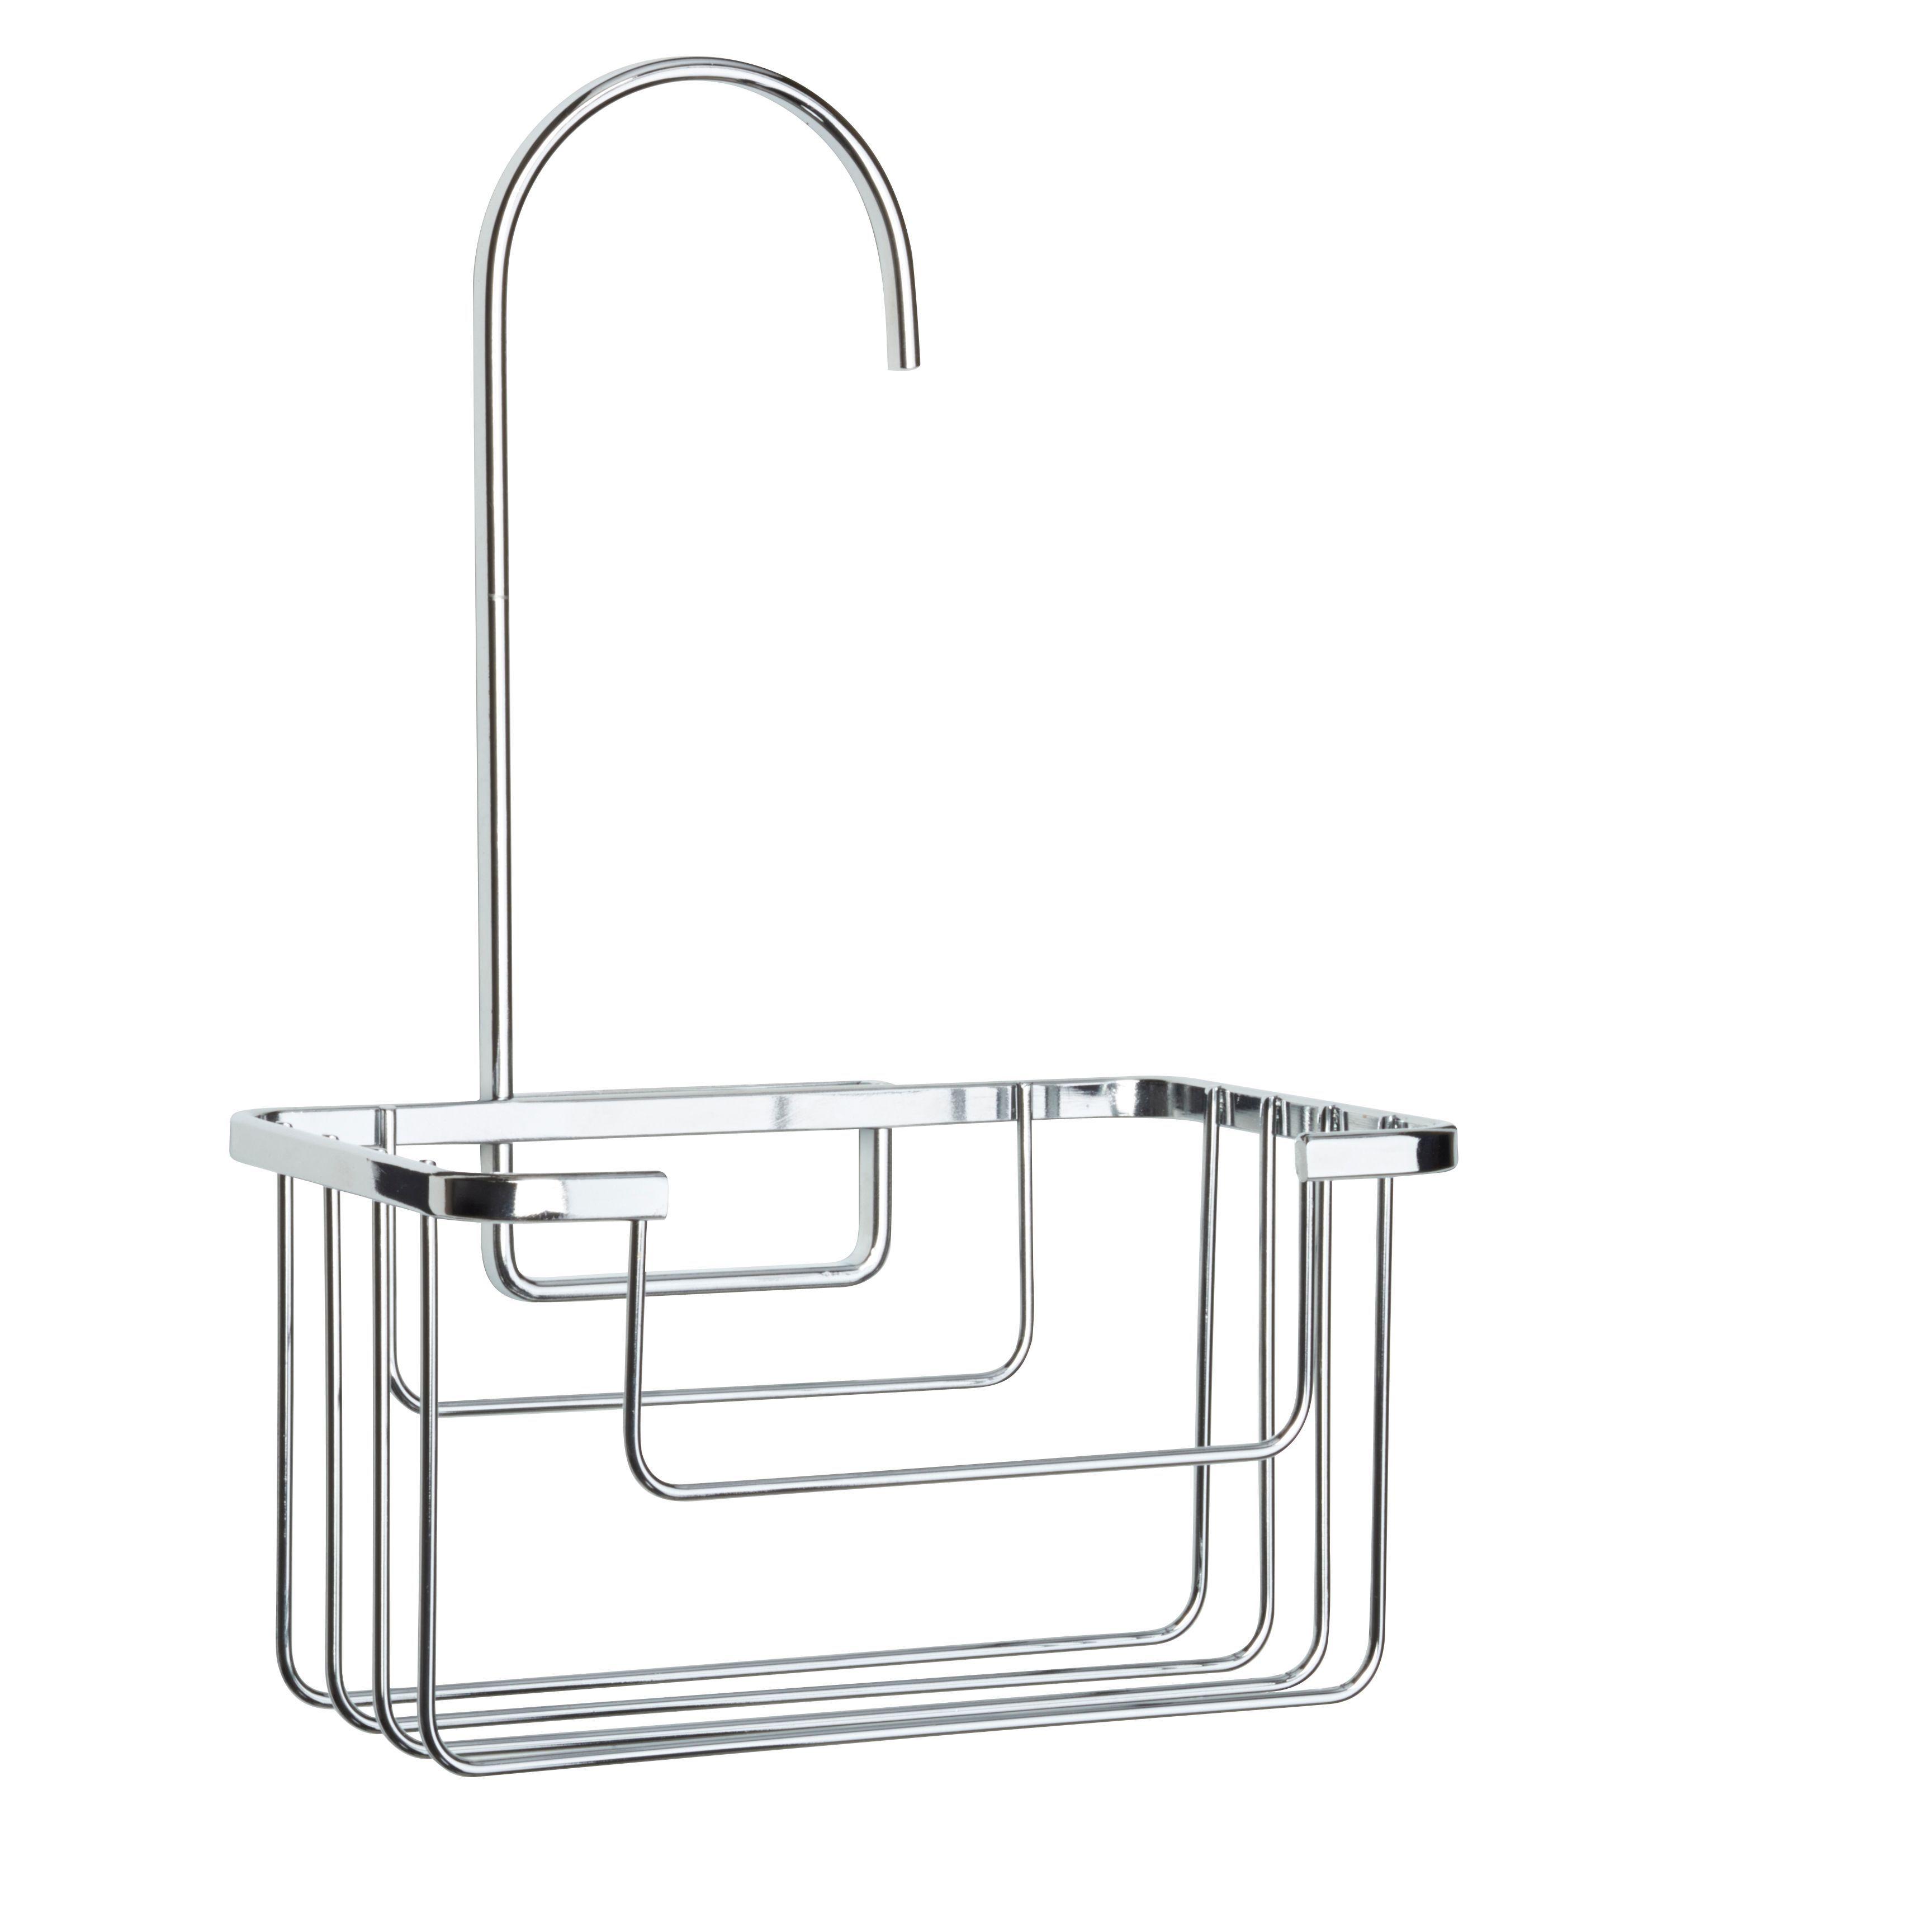 Tier basket shower caddy mild steel rust free stick n lock bathroom - Croydex Chrome Effect Mild Steel Hook Over Basket